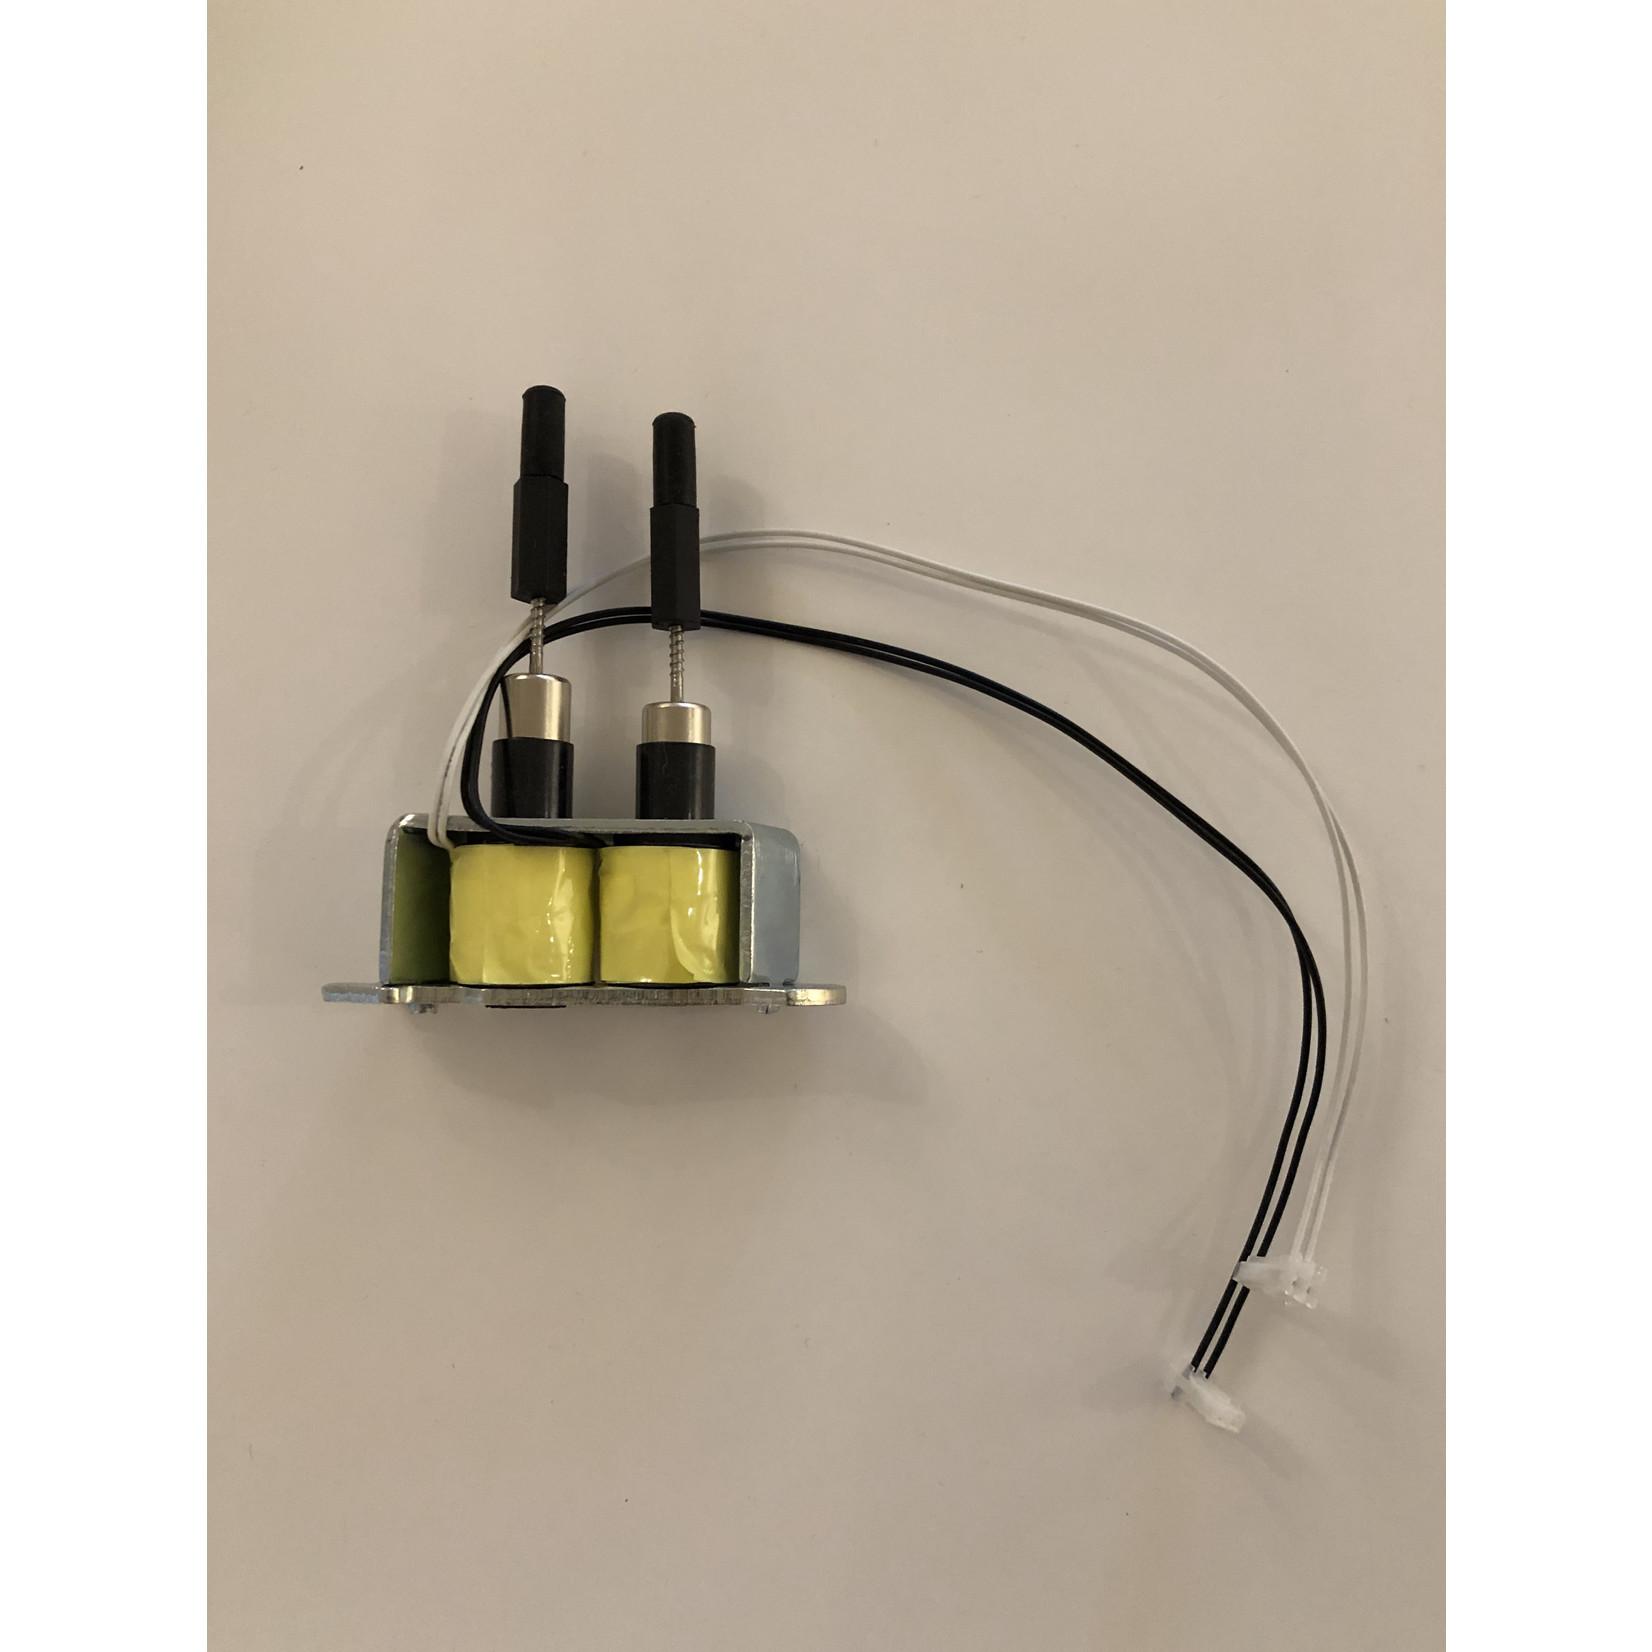 PianoDisc LP profile key solenoid